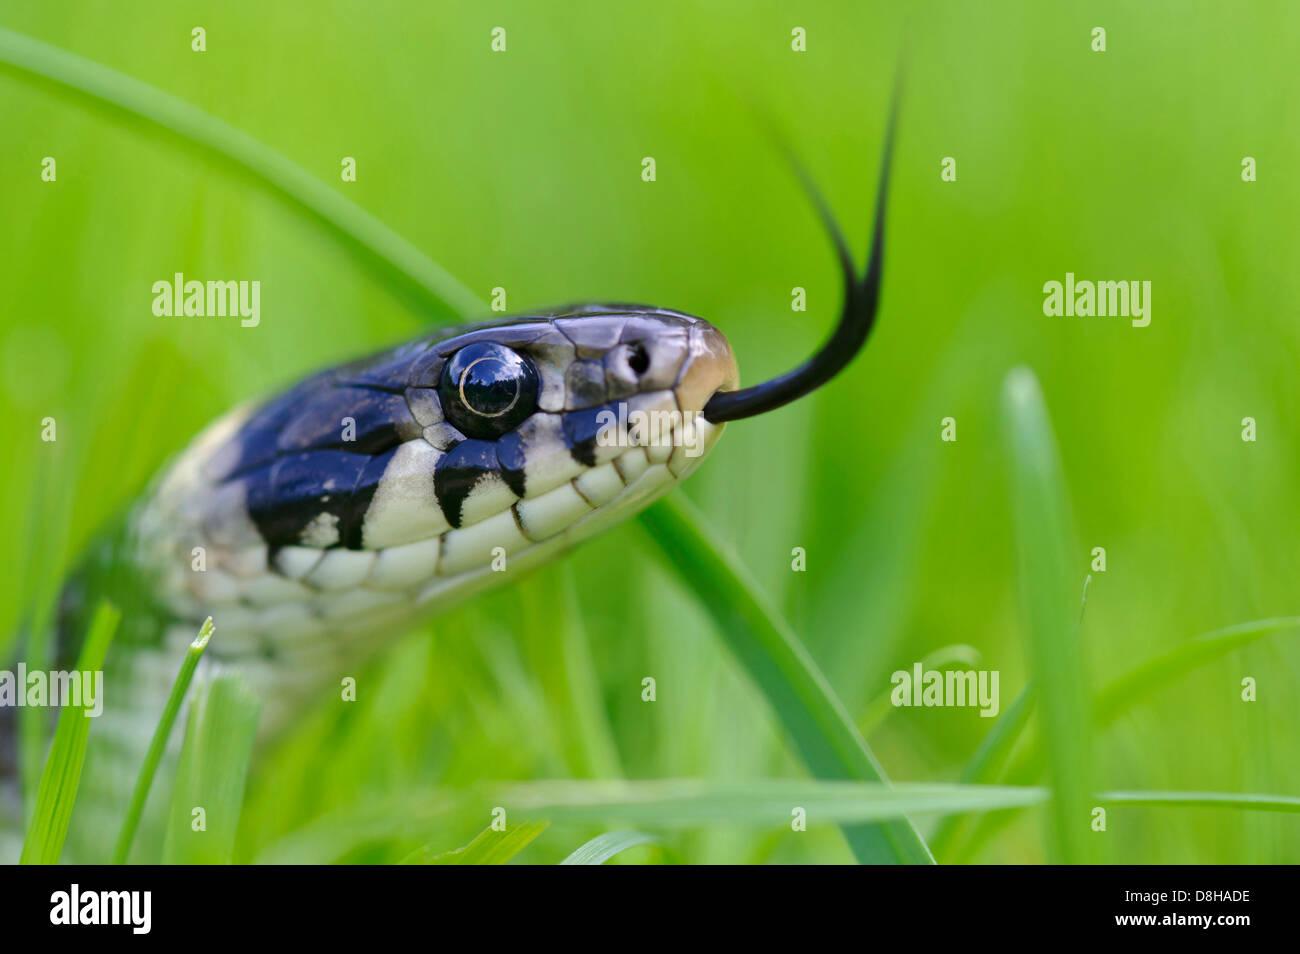 Couleuvre vipérine, Natrix natrix, goldenstedter Moor, Basse-Saxe, Allemagne Photo Stock